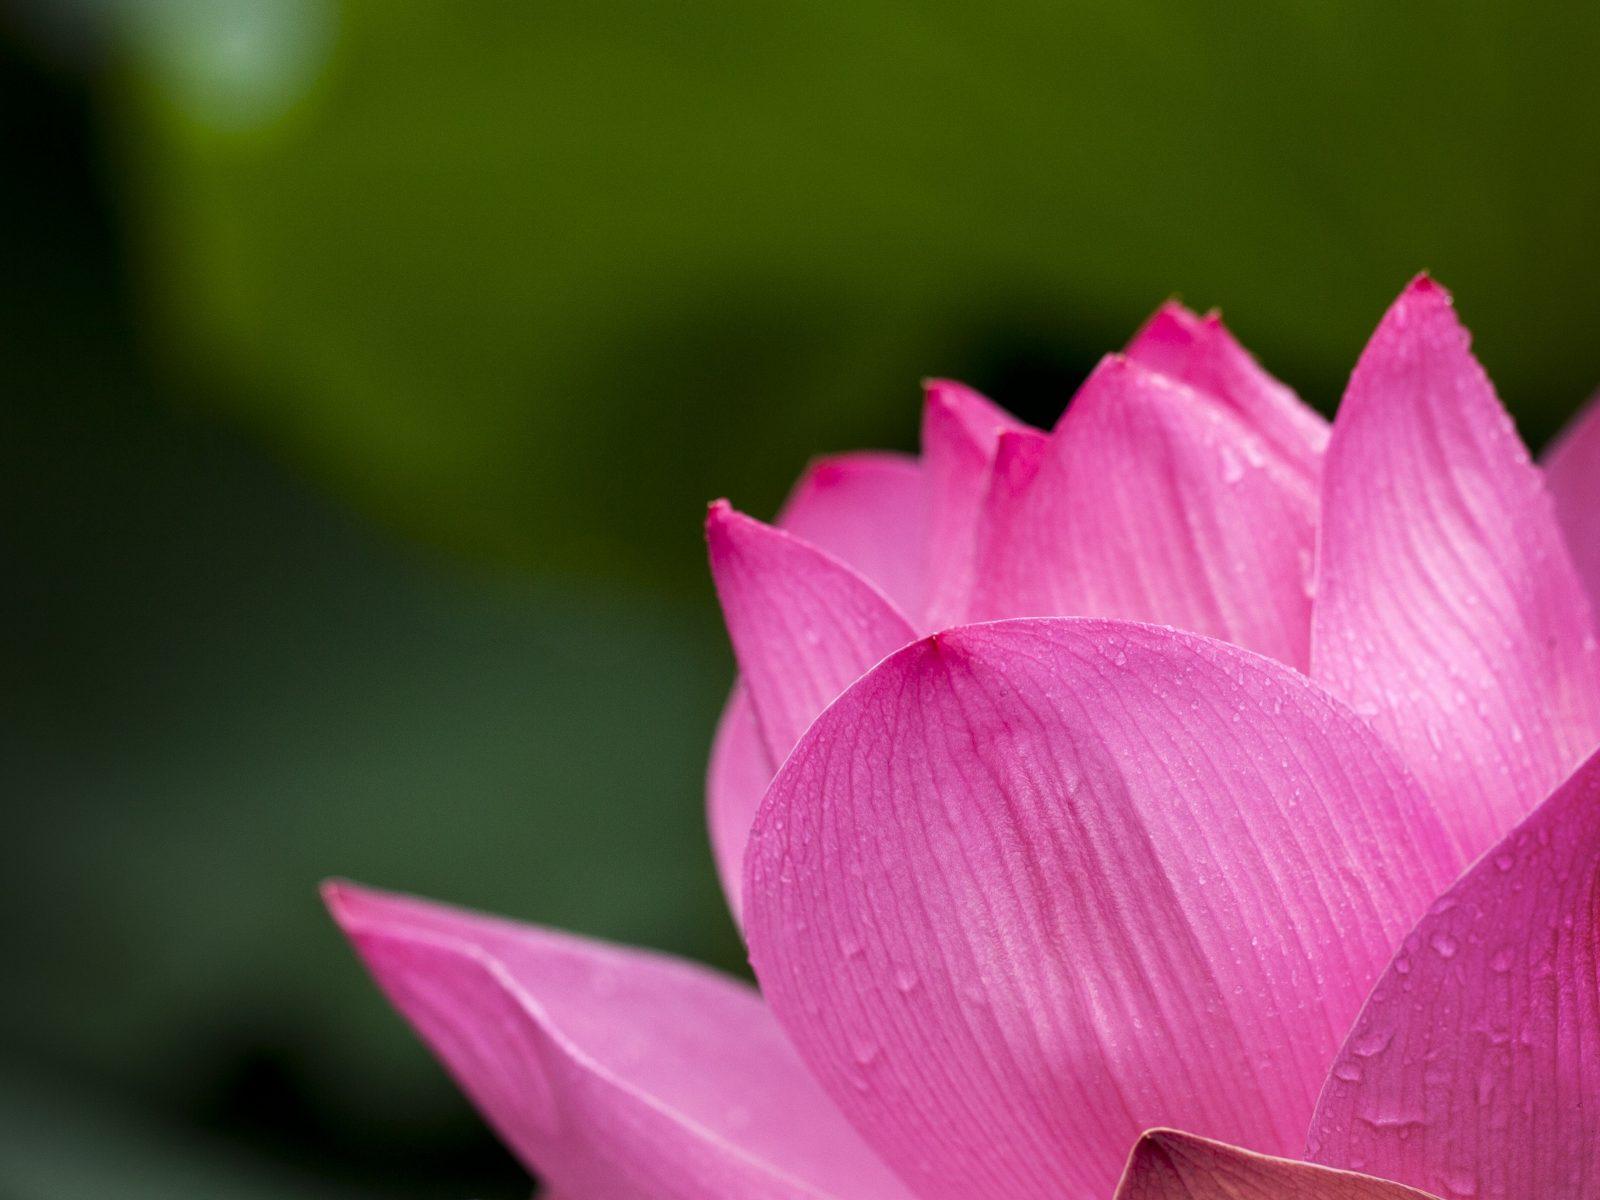 Pink Lotus Flower 4k Wallpaper Hd Wallpaper Background